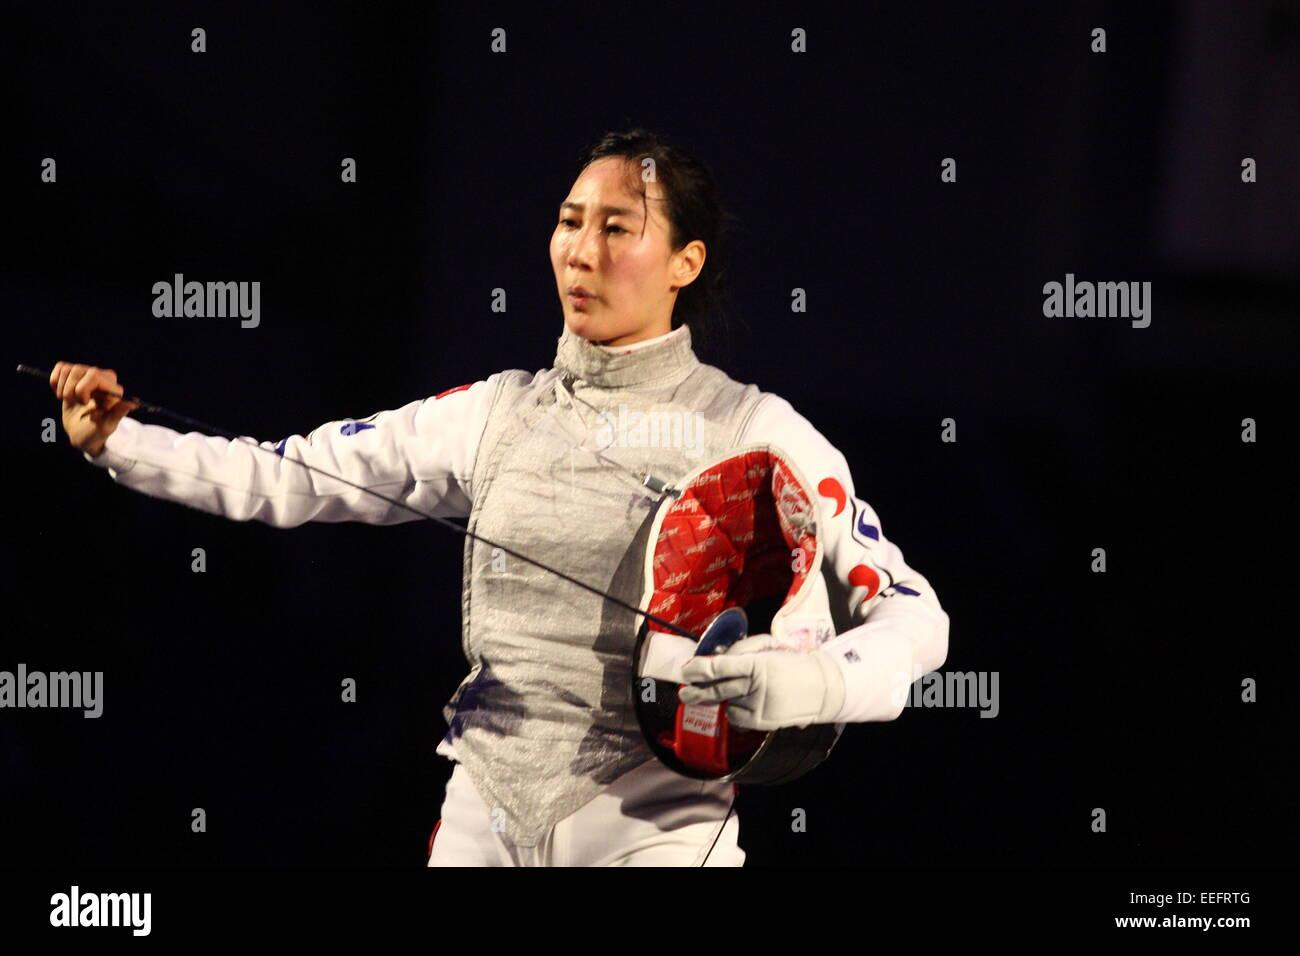 Artus Court  Fencing Cup In Gdansk First Semi Final Game Jeon Hee Sook Korea Fights Against Ines Boubakari Tun Credit Michal